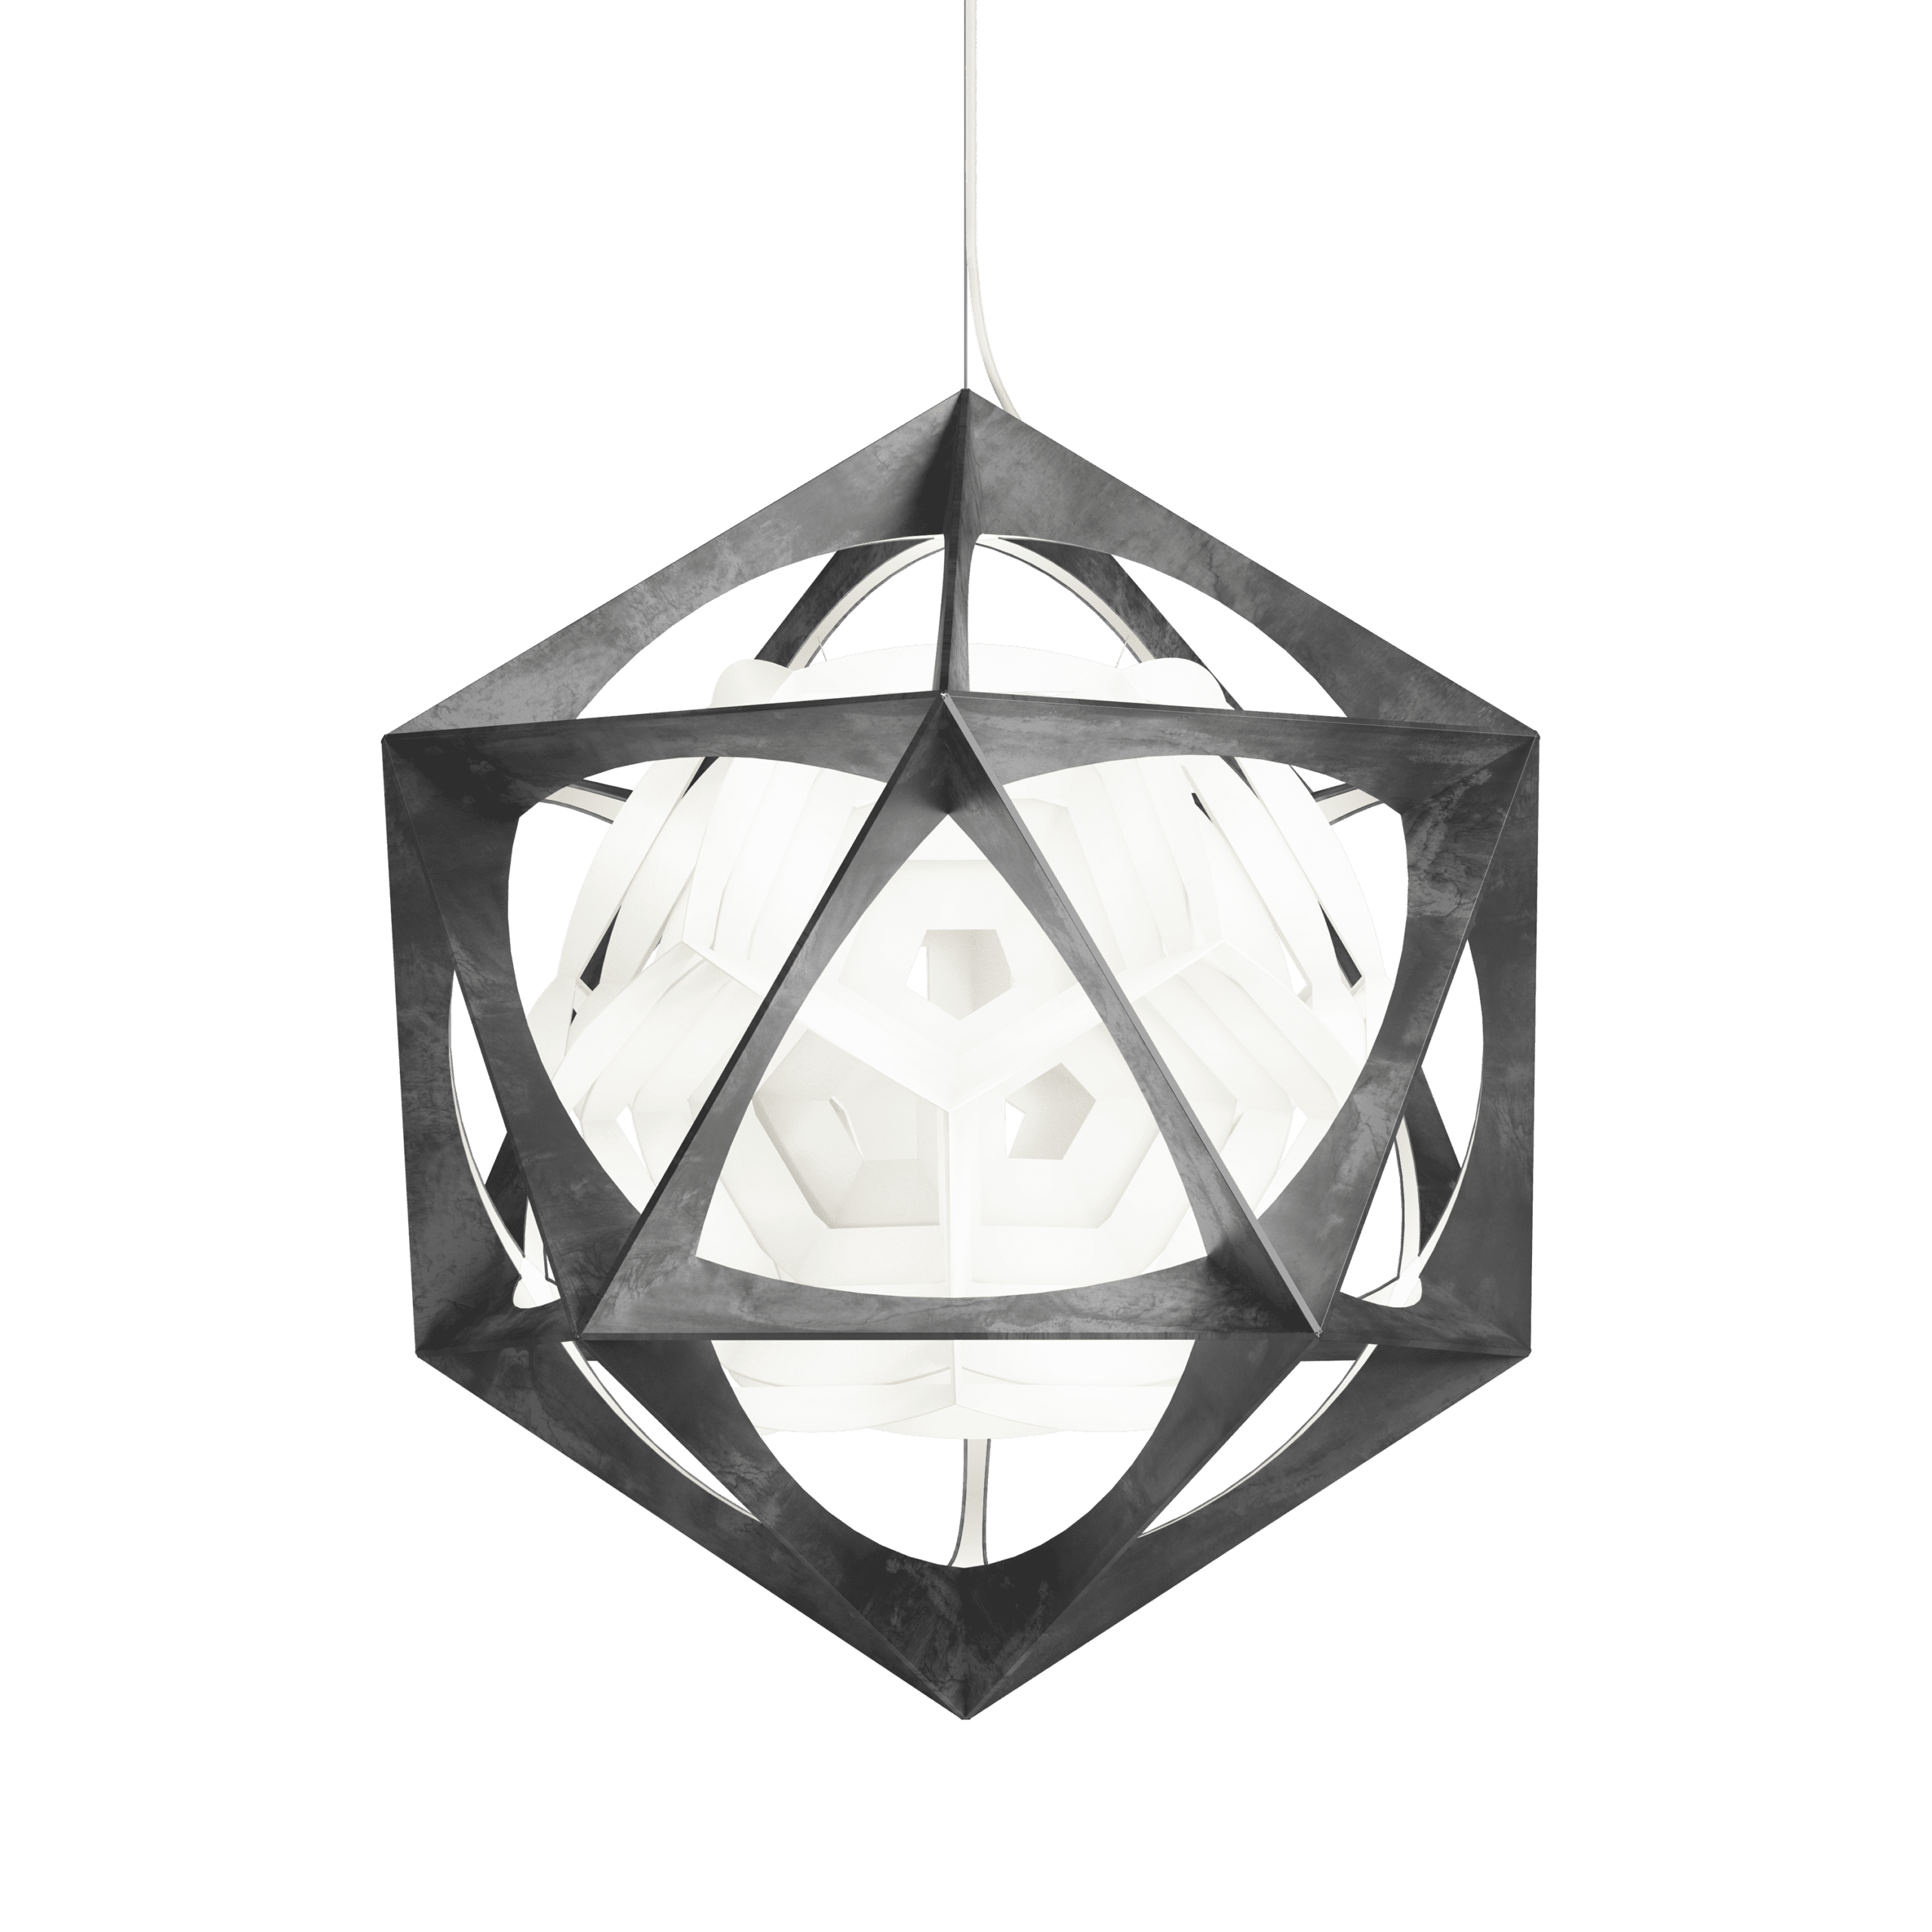 Pendel OE Quasi Light Louis Poulsen design Olafur Eliasson Indbo